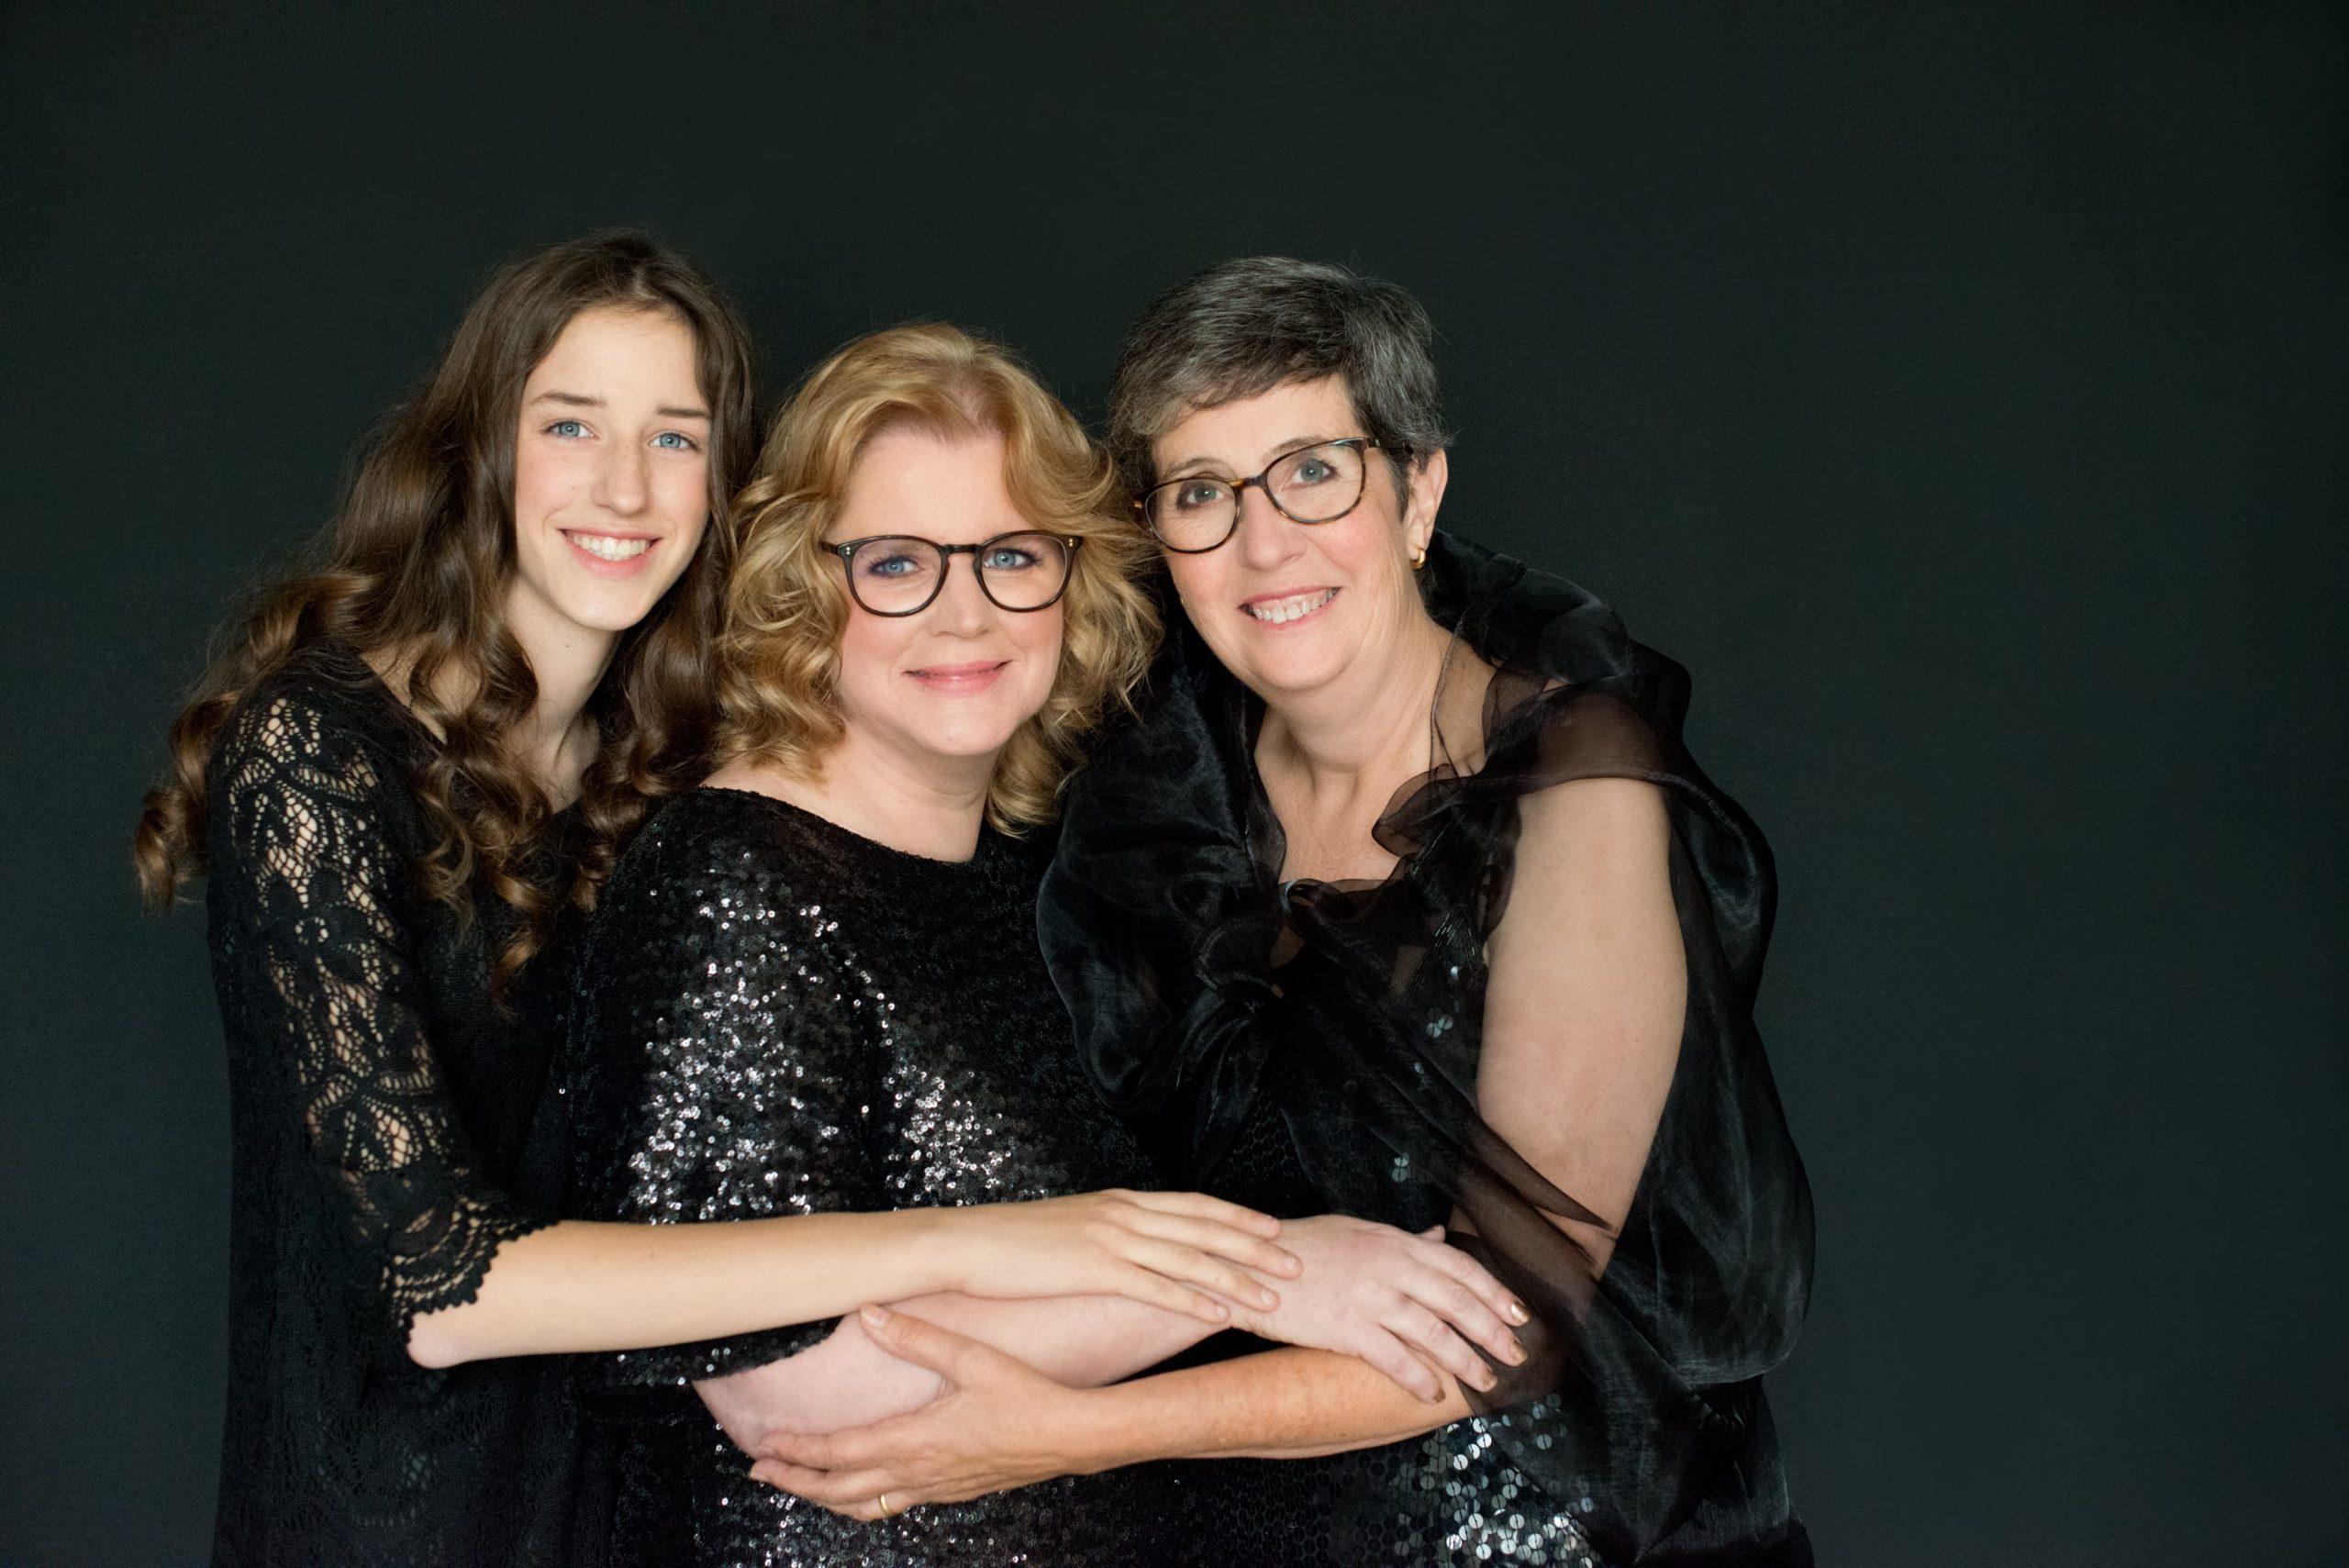 Family Portraits familie fotoshoot all black black on black